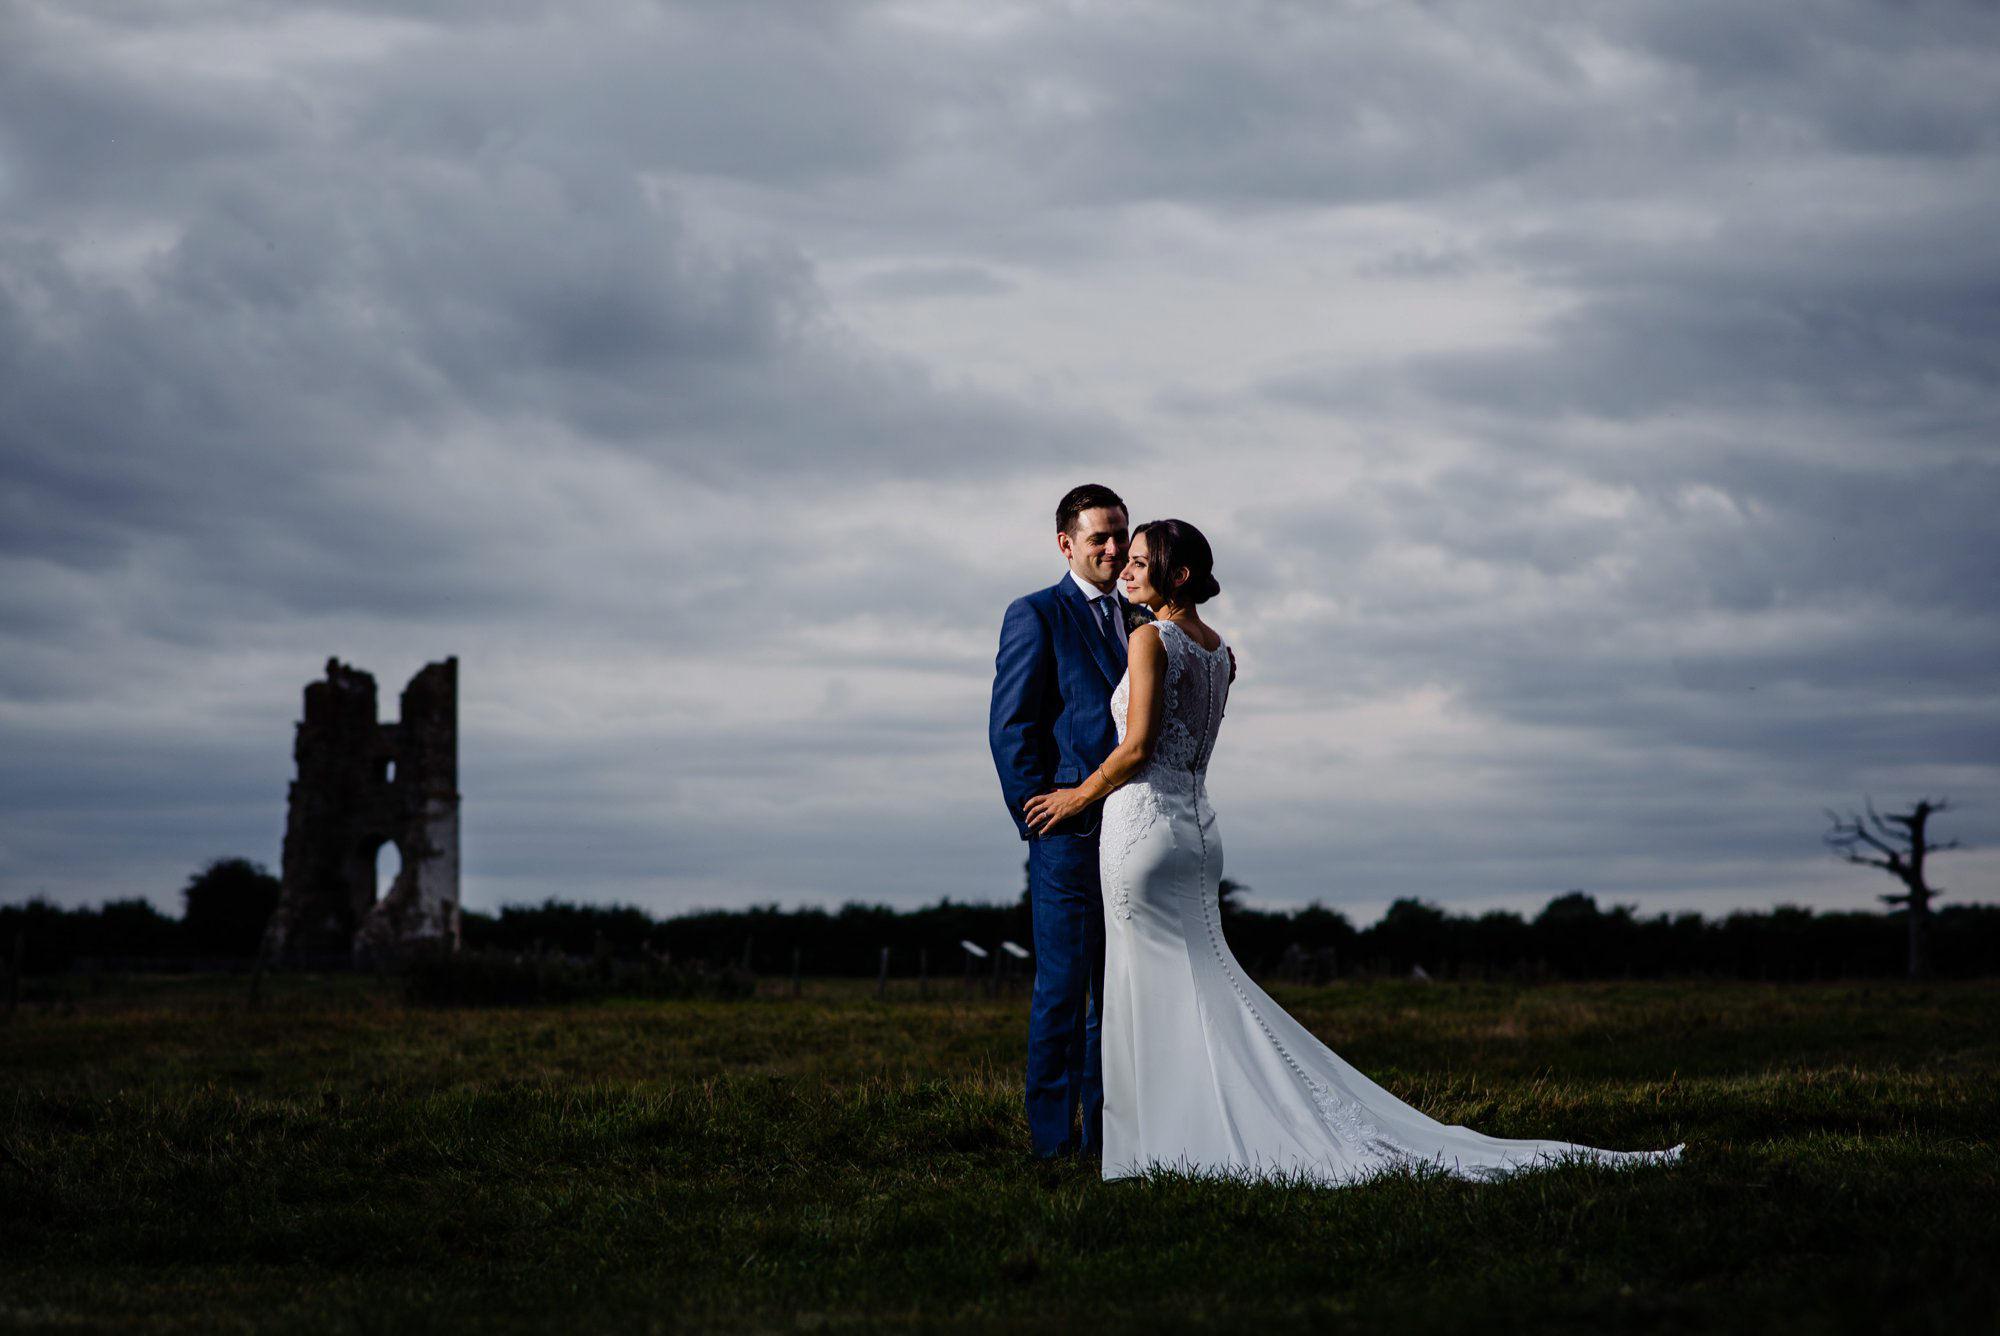 Godwick Wedding Photography